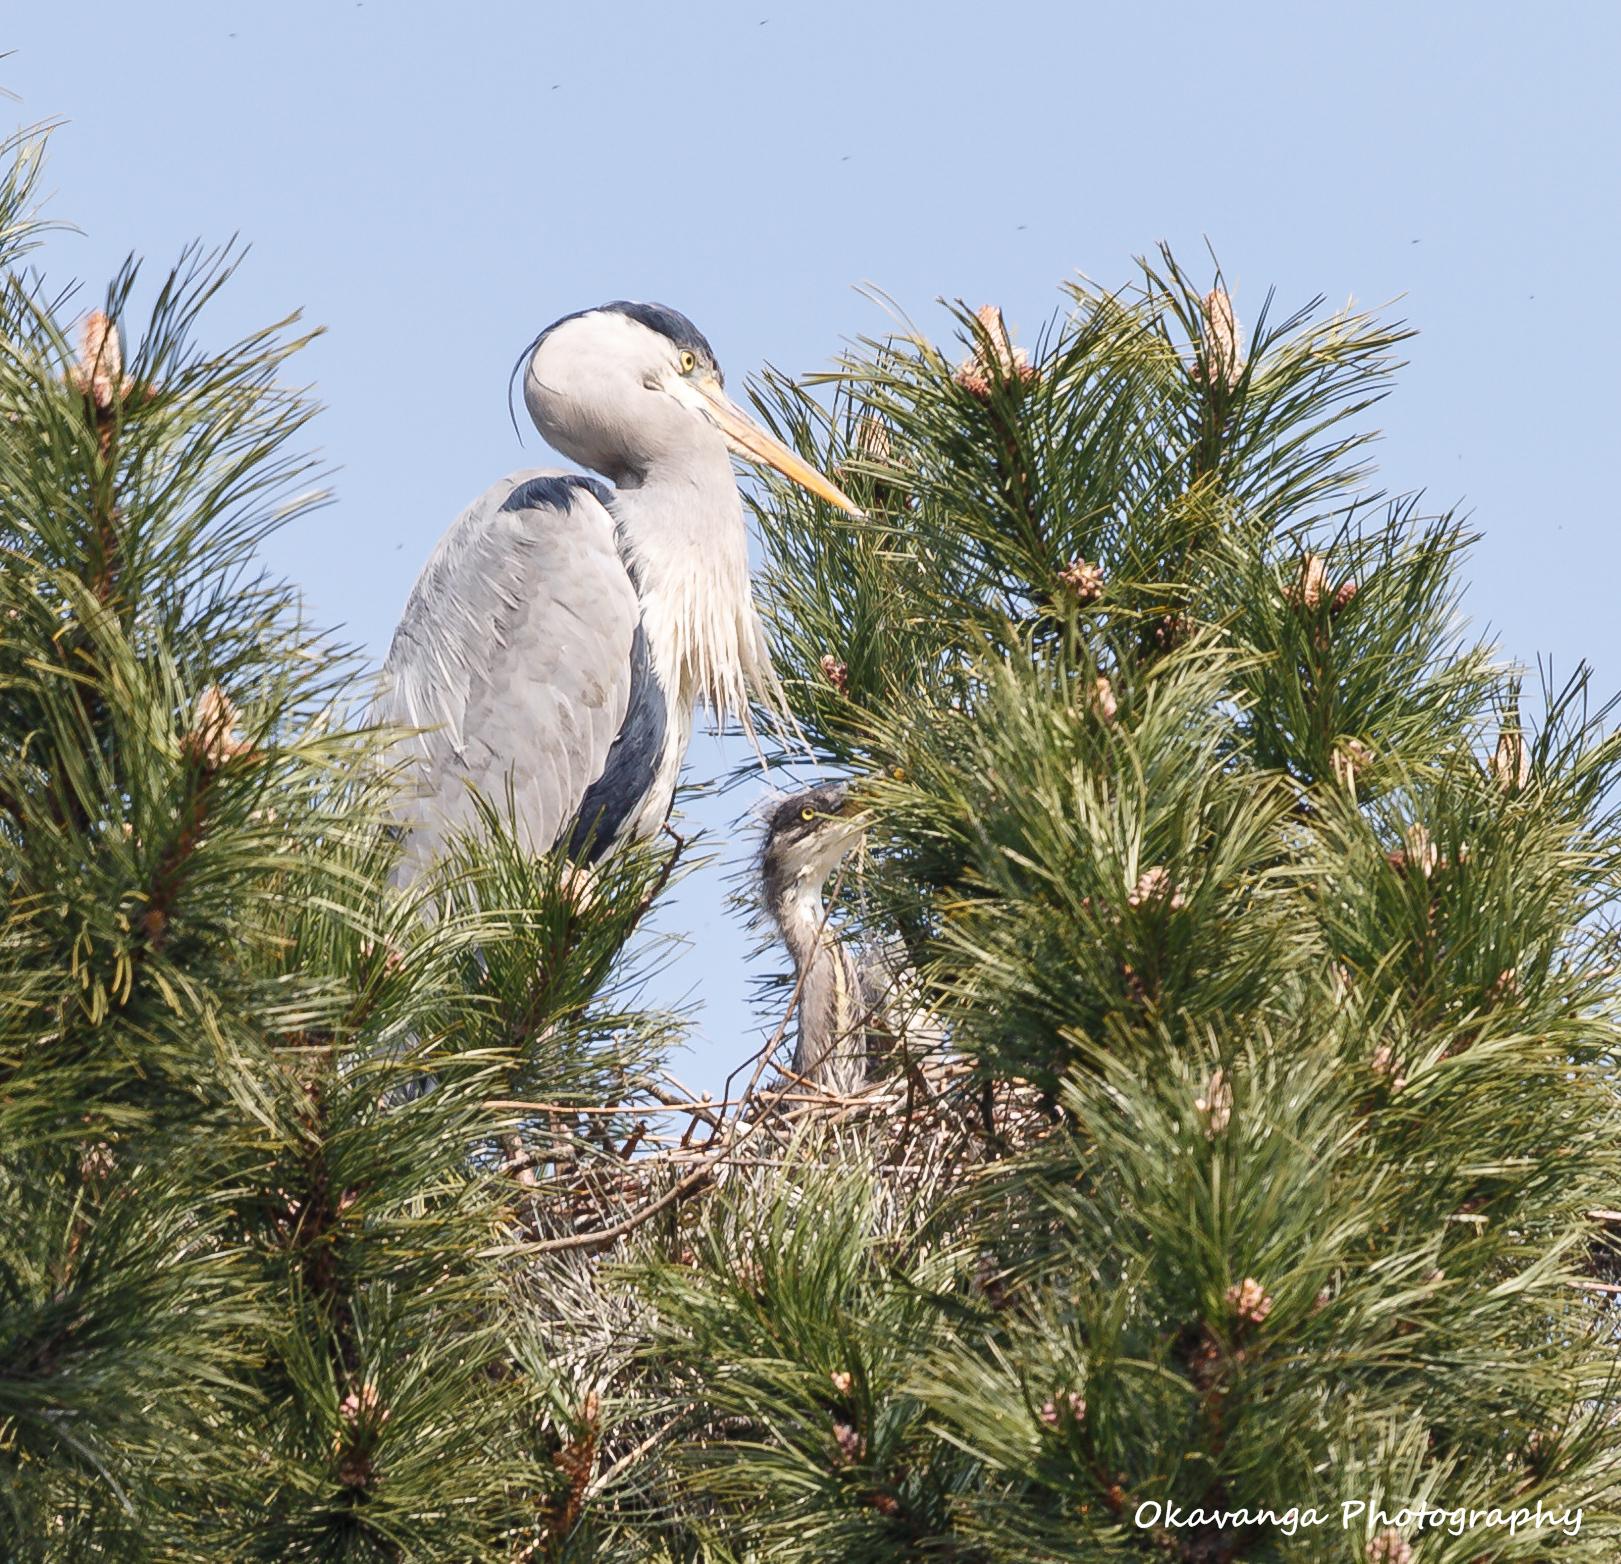 Heron 7 - Where's Dad? by Okavanga